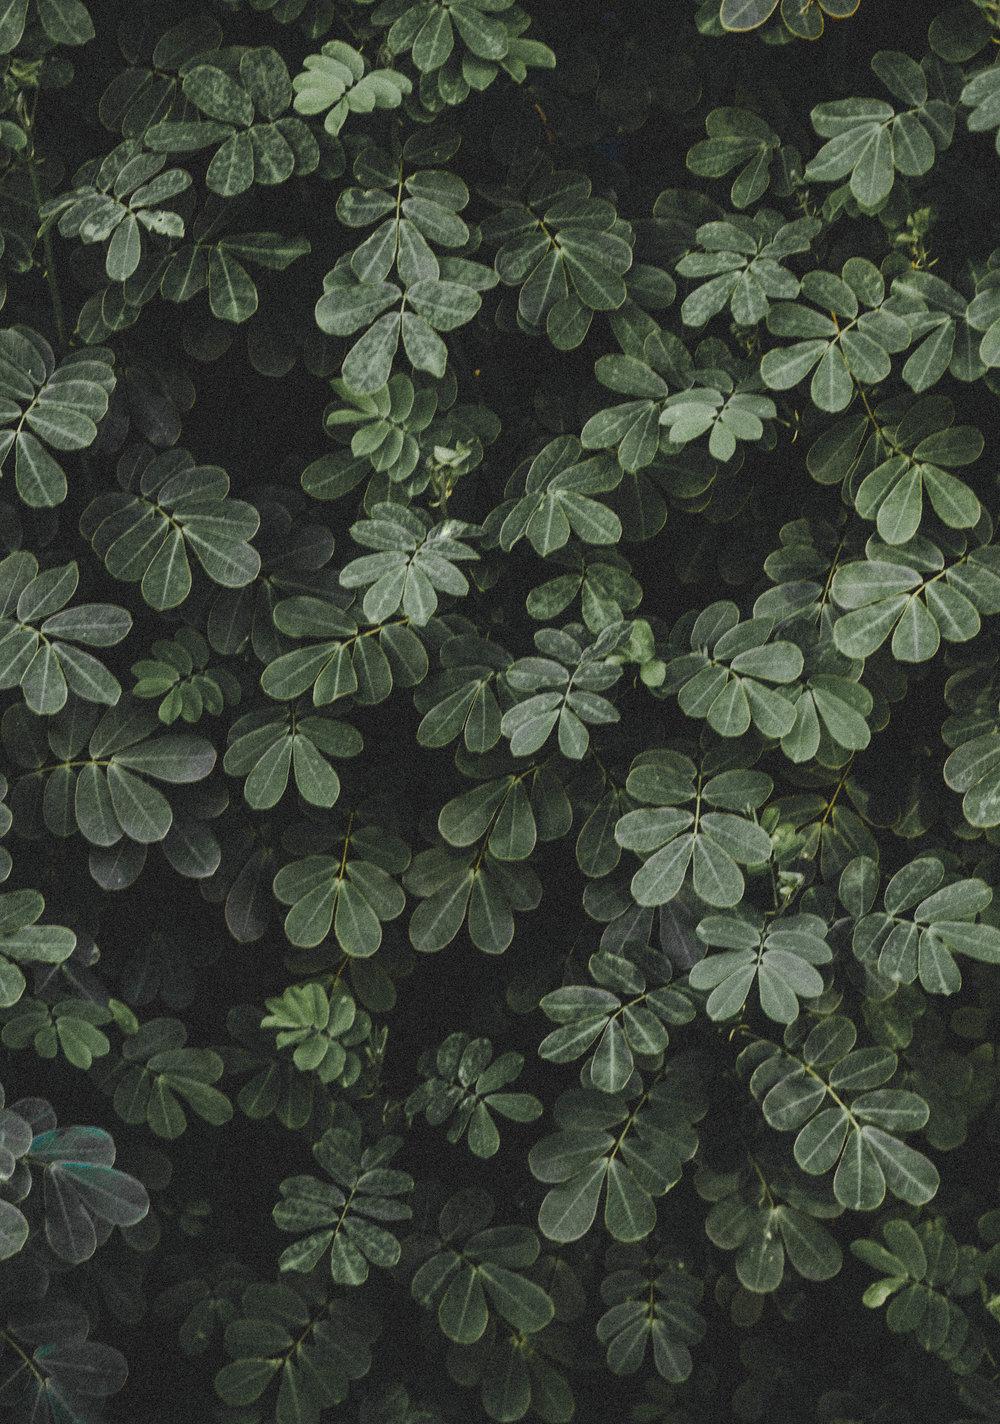 plant--2.JPG